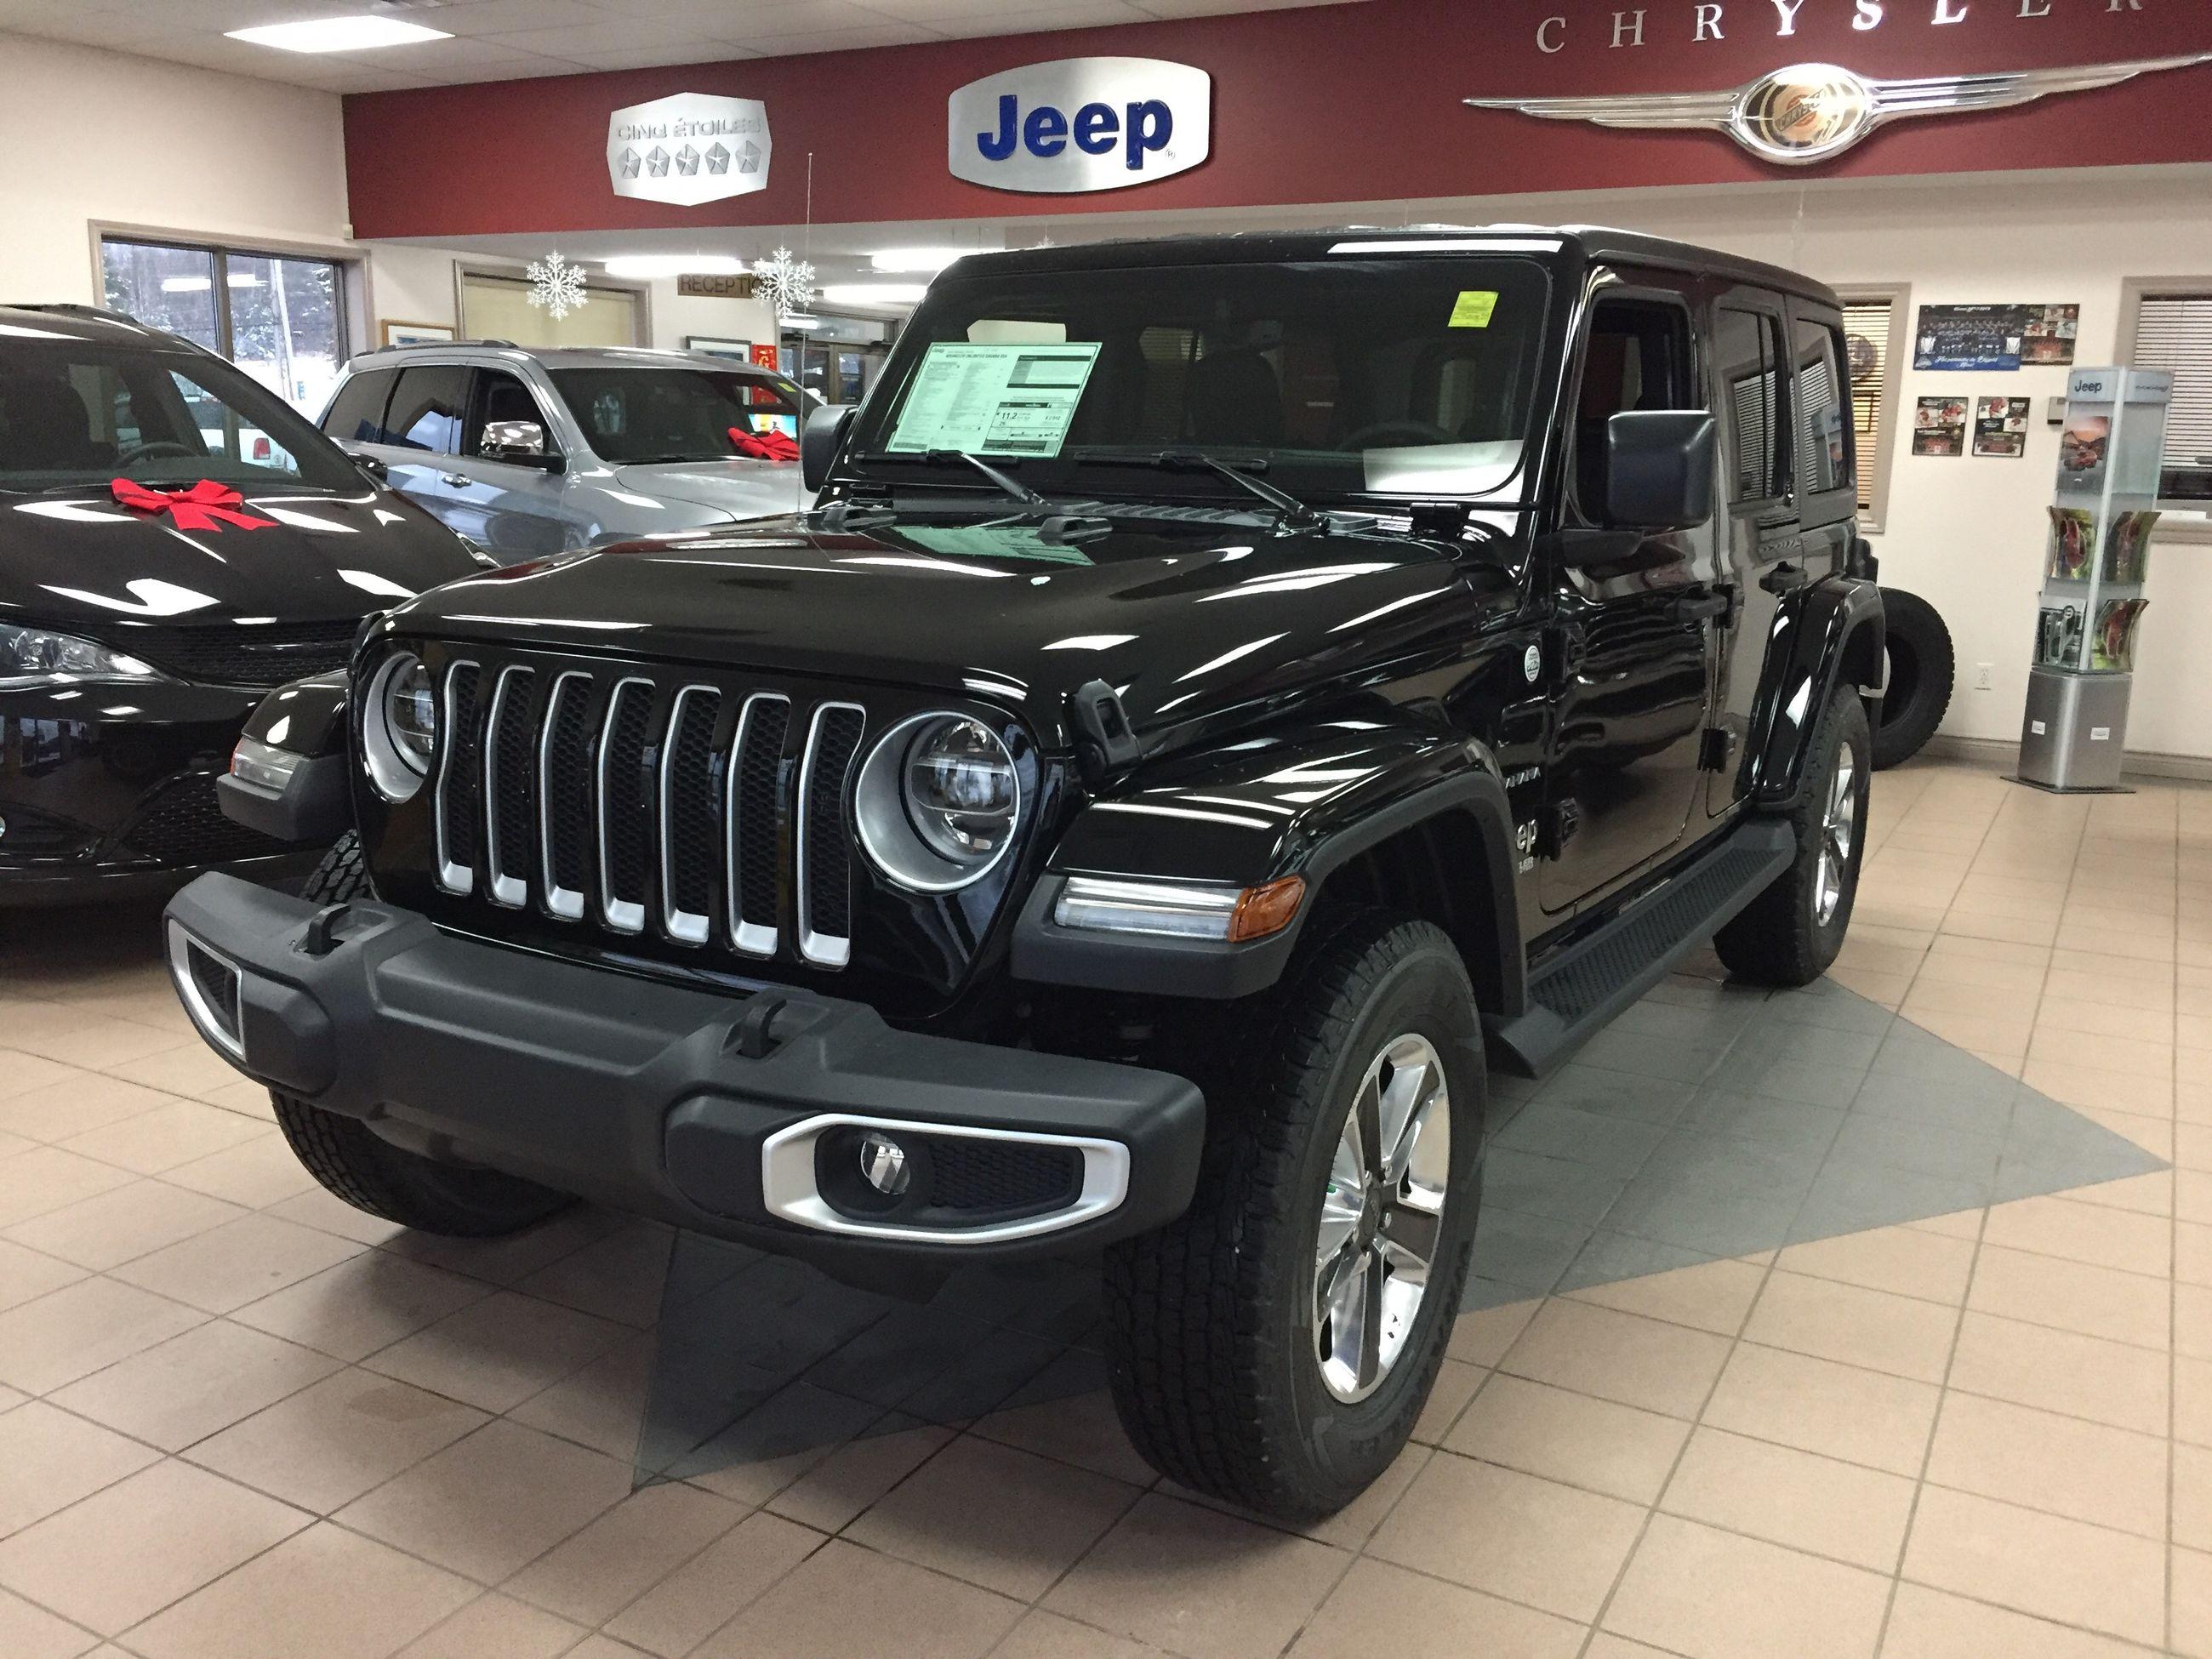 Jeep Wrangler Sahara For Sale >> New 2020 Jeep Wrangler Unlimited SAHARA for sale in - Rendez-vous Chrysler in , New Brunswick